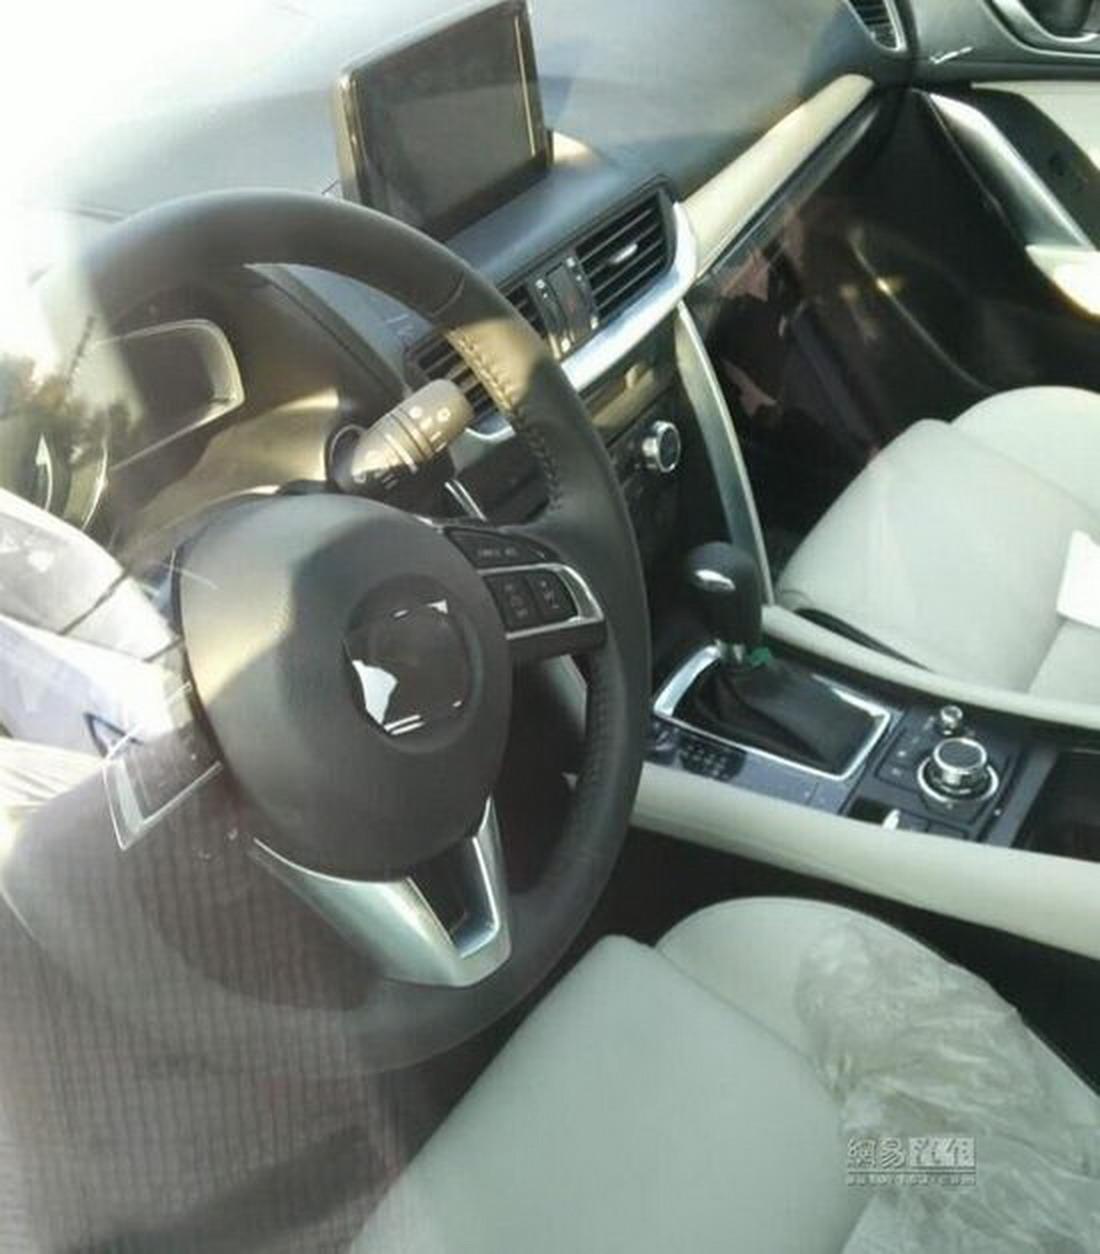 Overhauled 2019 Acura Rdx Crossover Debuts Autoguide Com: New Mazda CX-4, CX-6 Or CX-7 Spied Undisguised